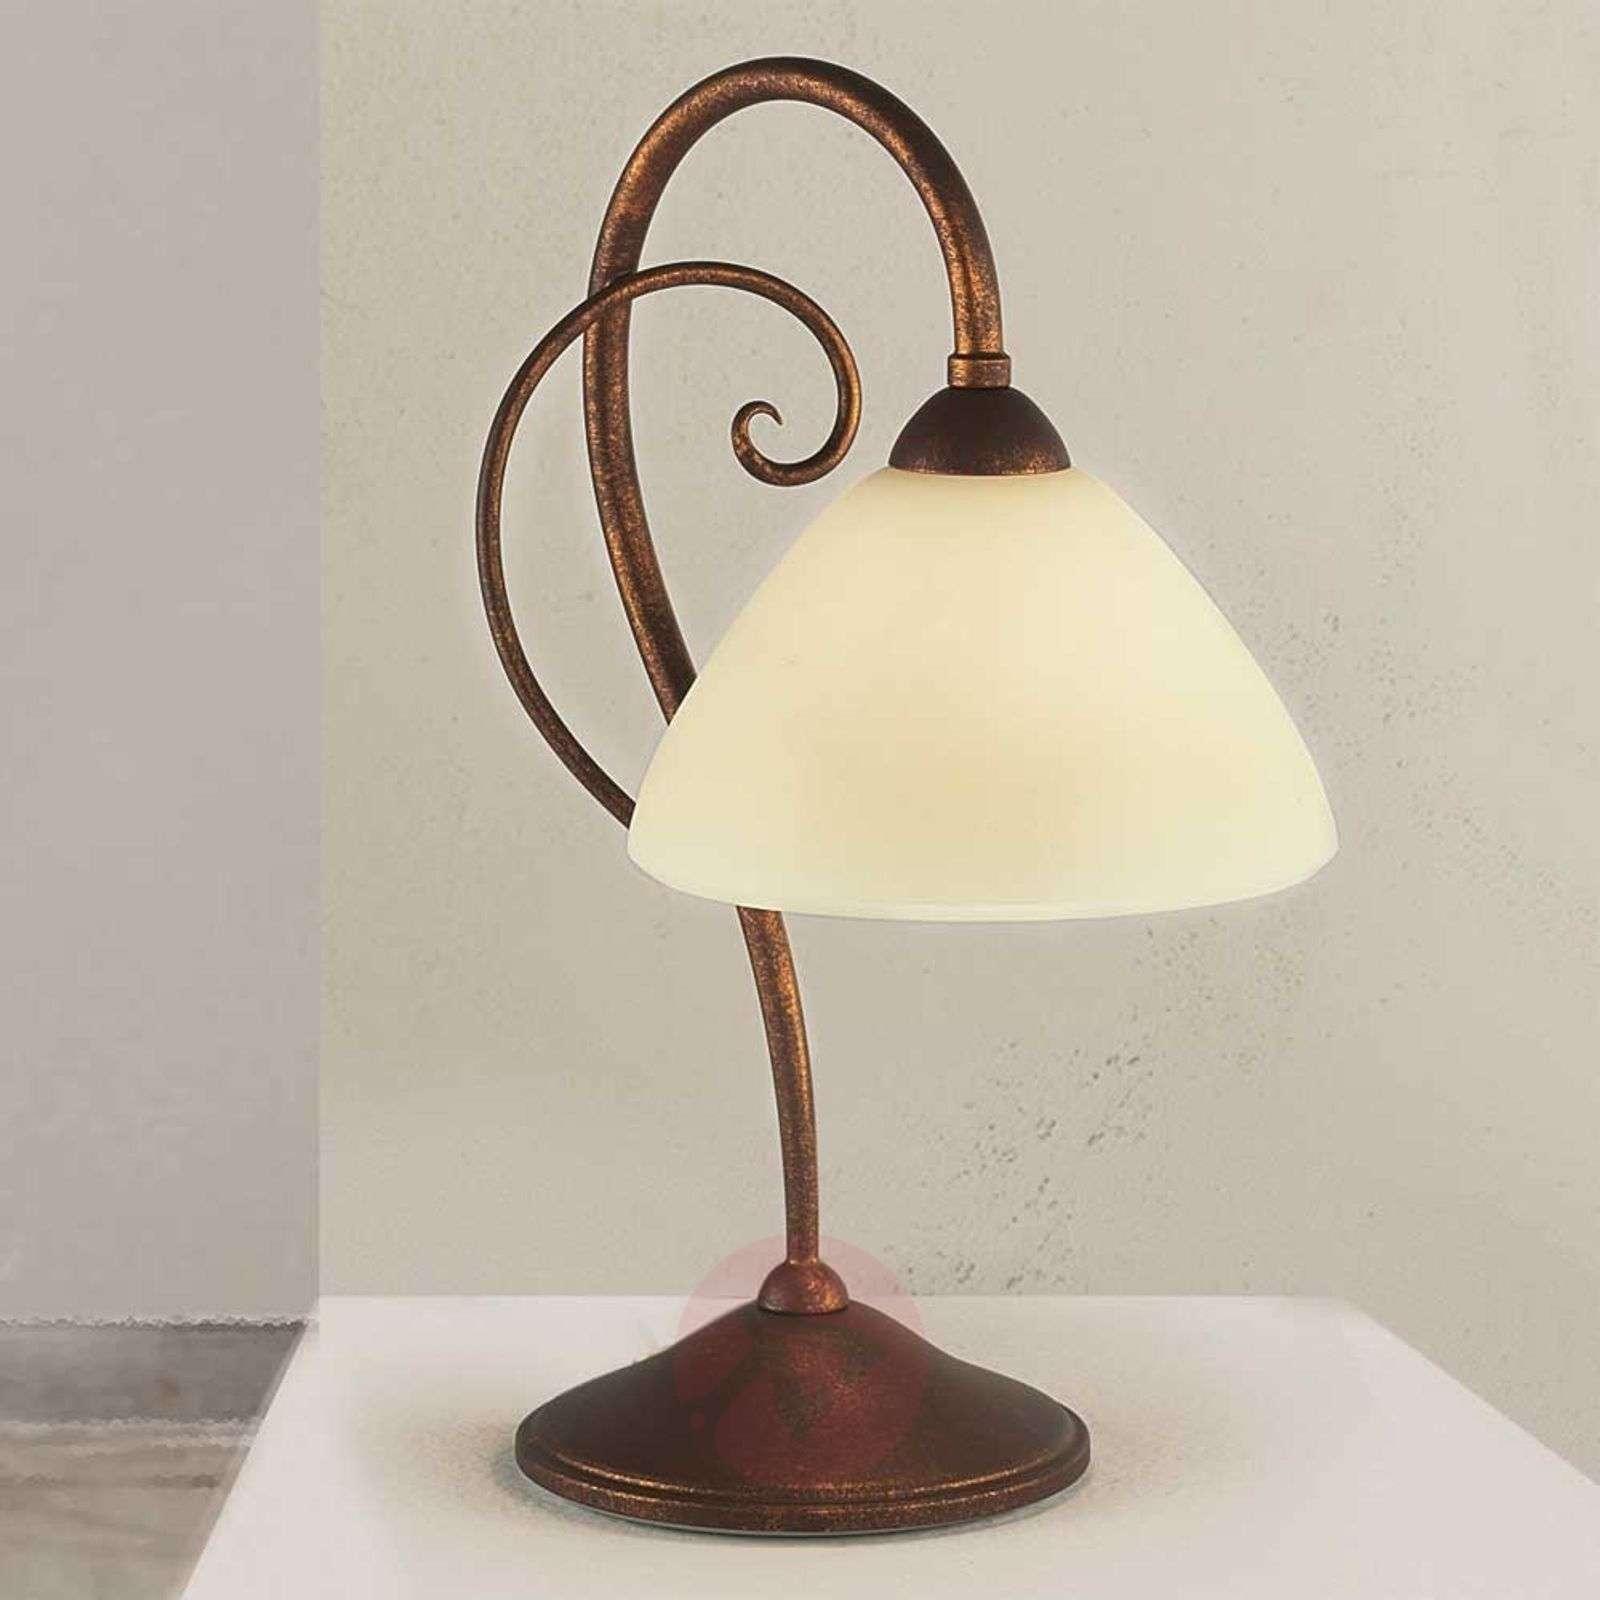 Attractive table lamp Federico-6059242-01